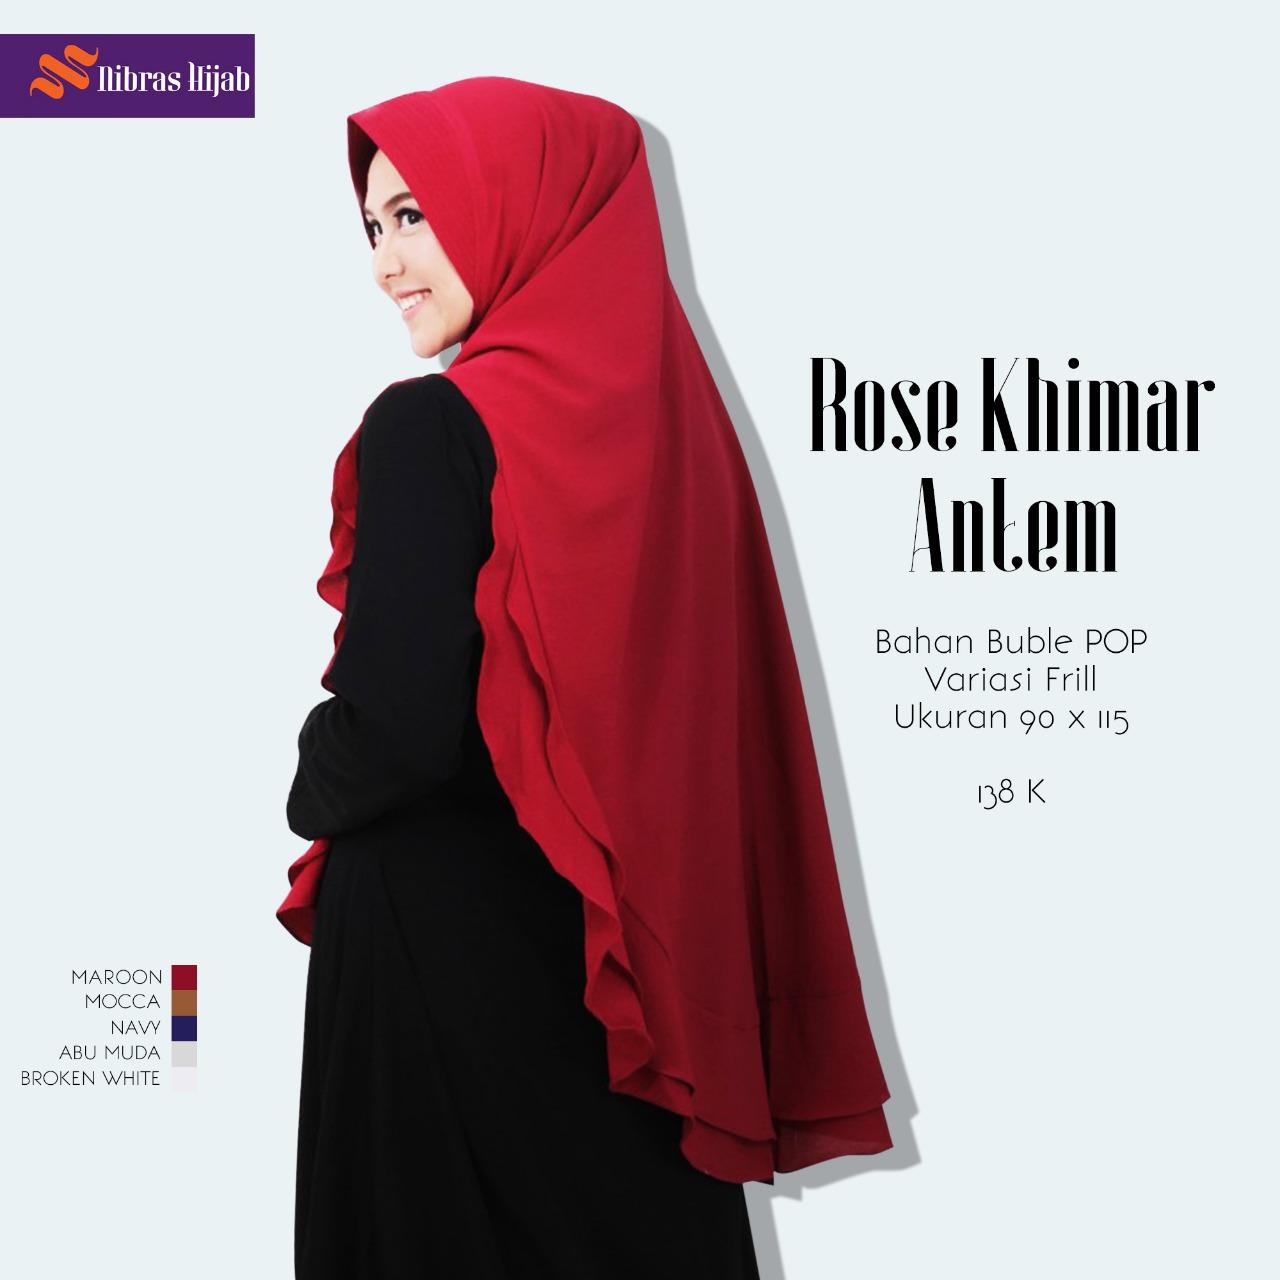 Koleksi Jilbab Nibras Terbaru Rose Khimar Antem